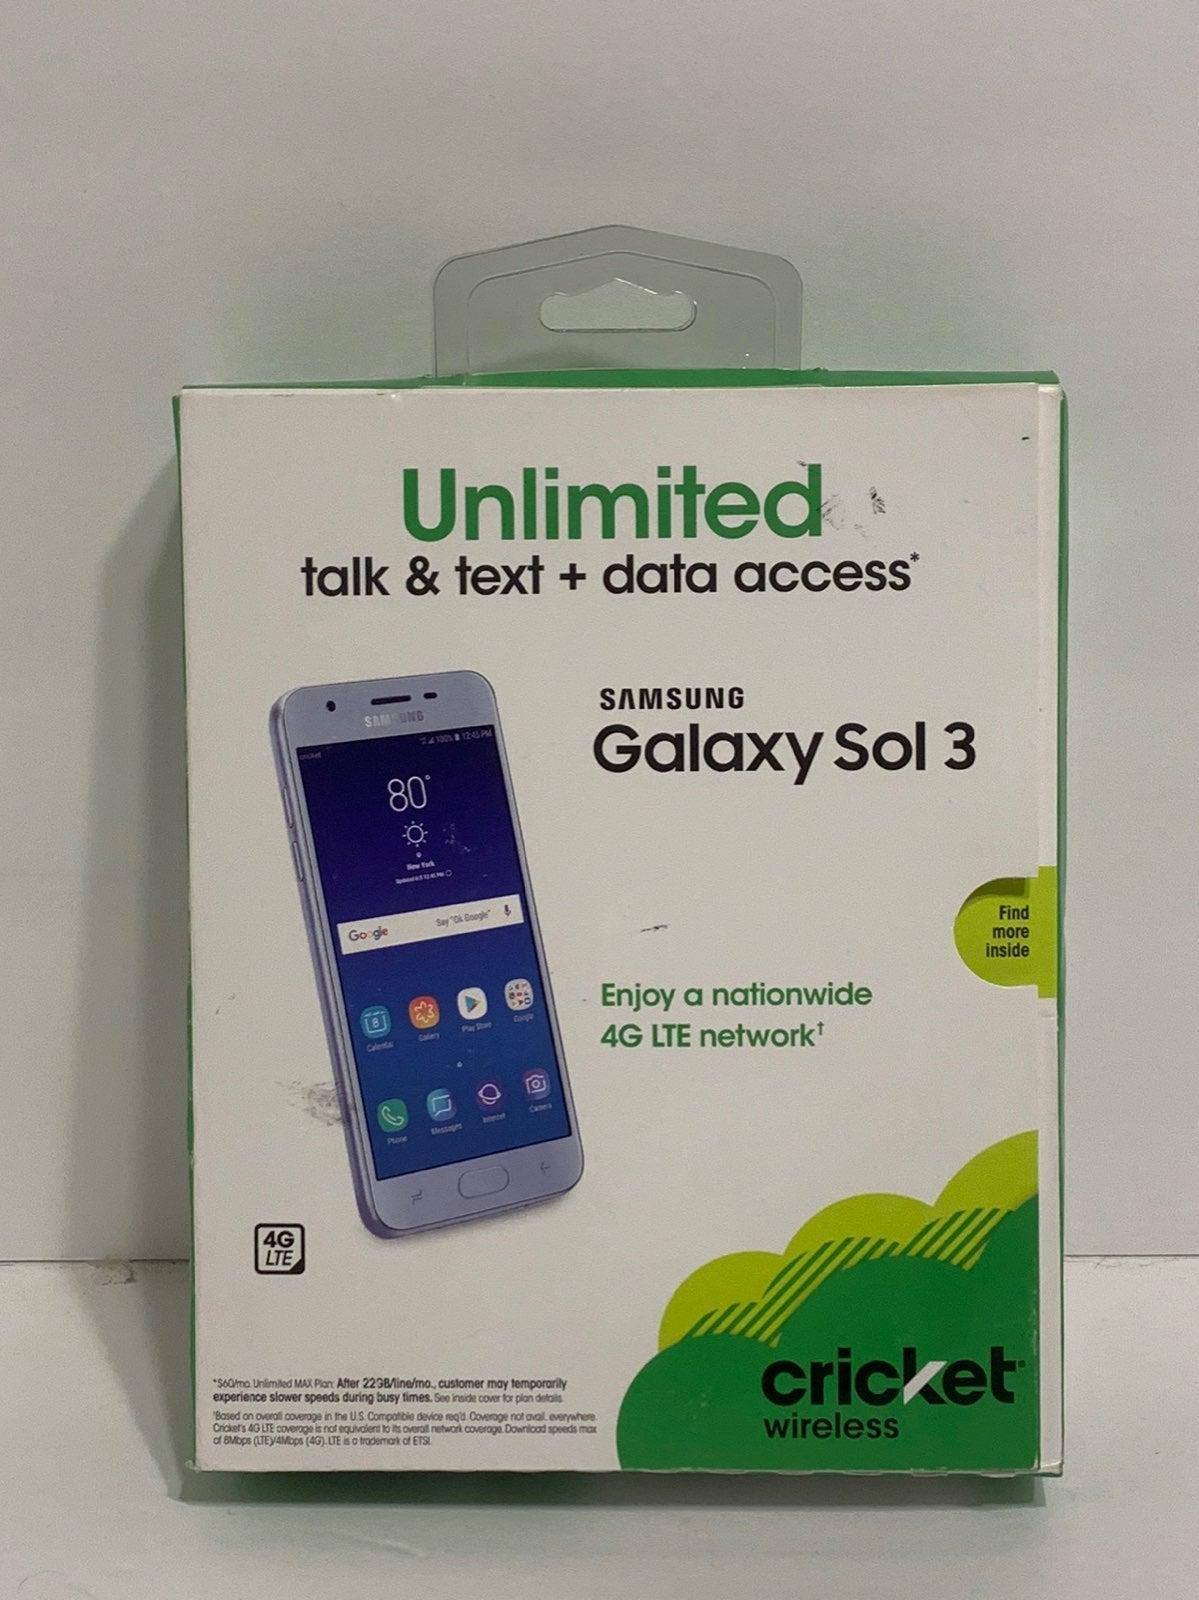 Cricket wireless Samsung Galaxy Sol 3